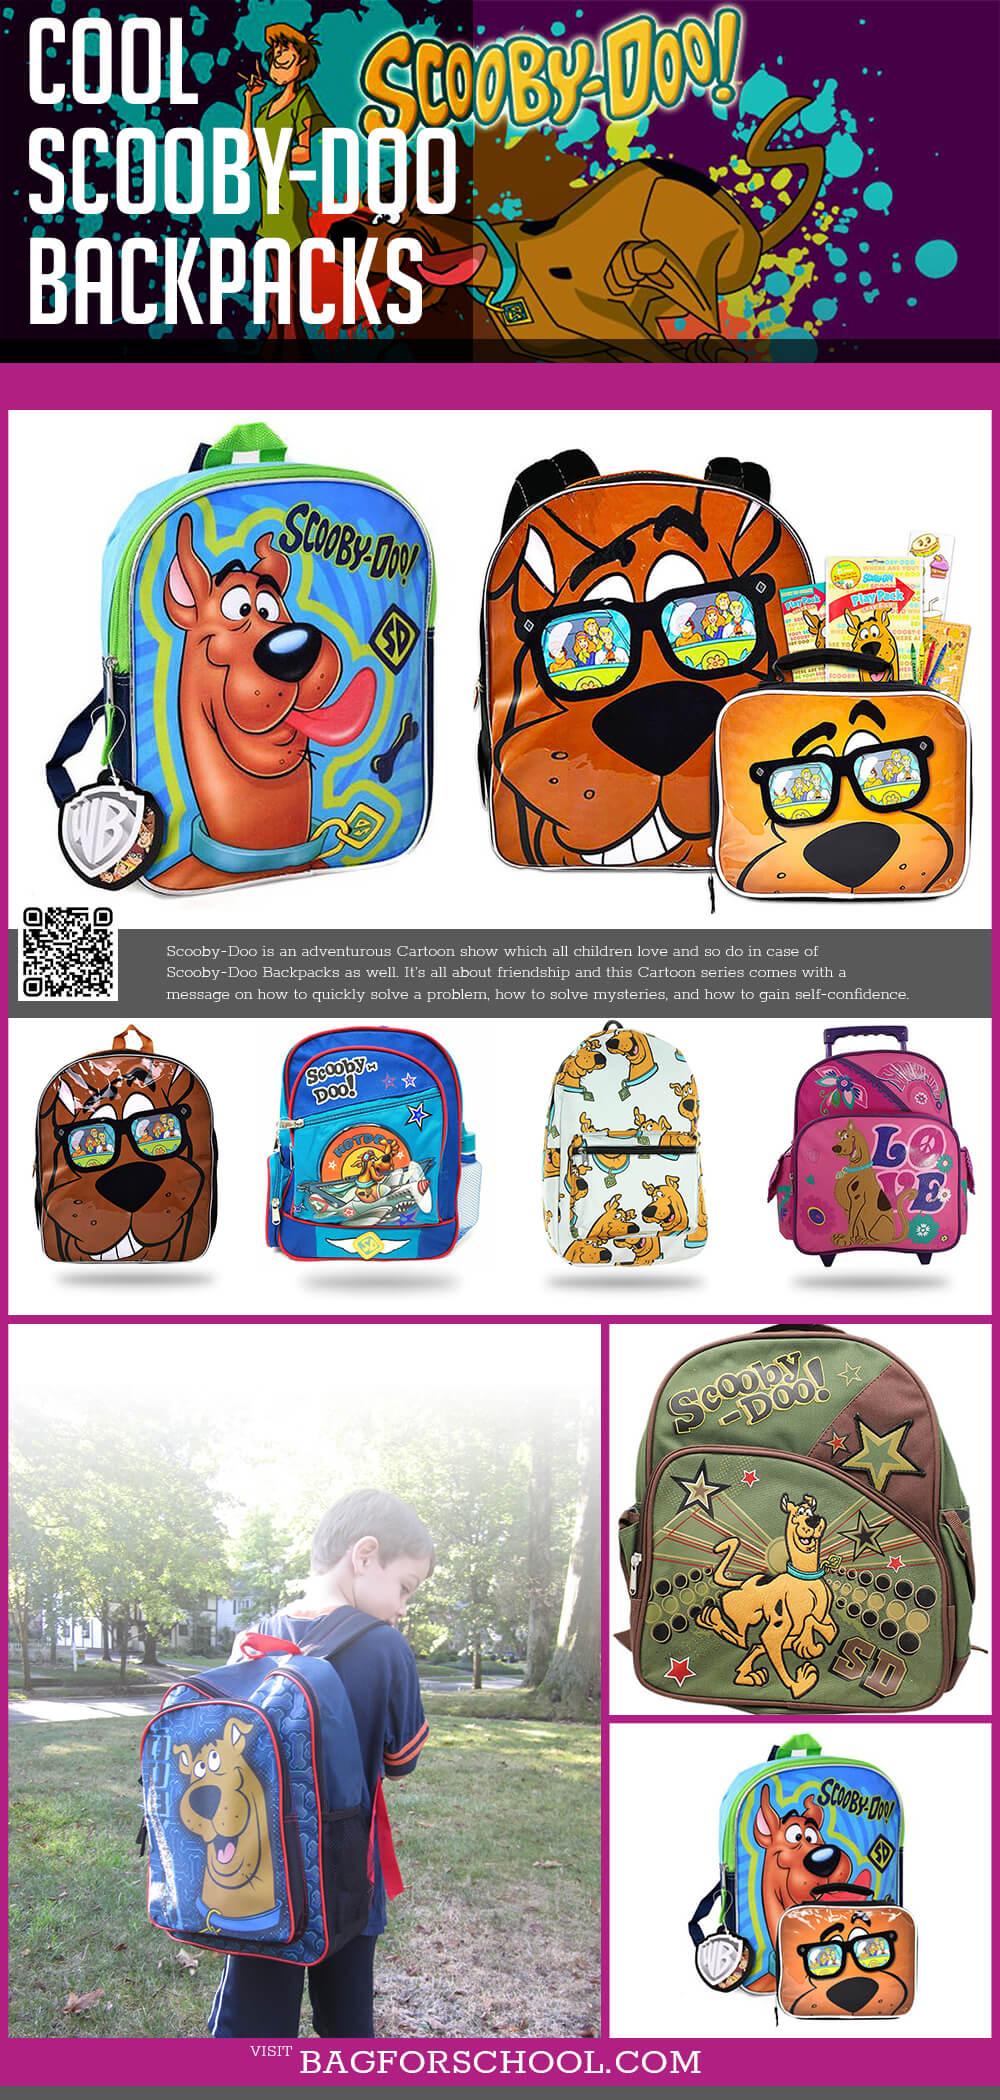 Scooby-Doo Backpacks